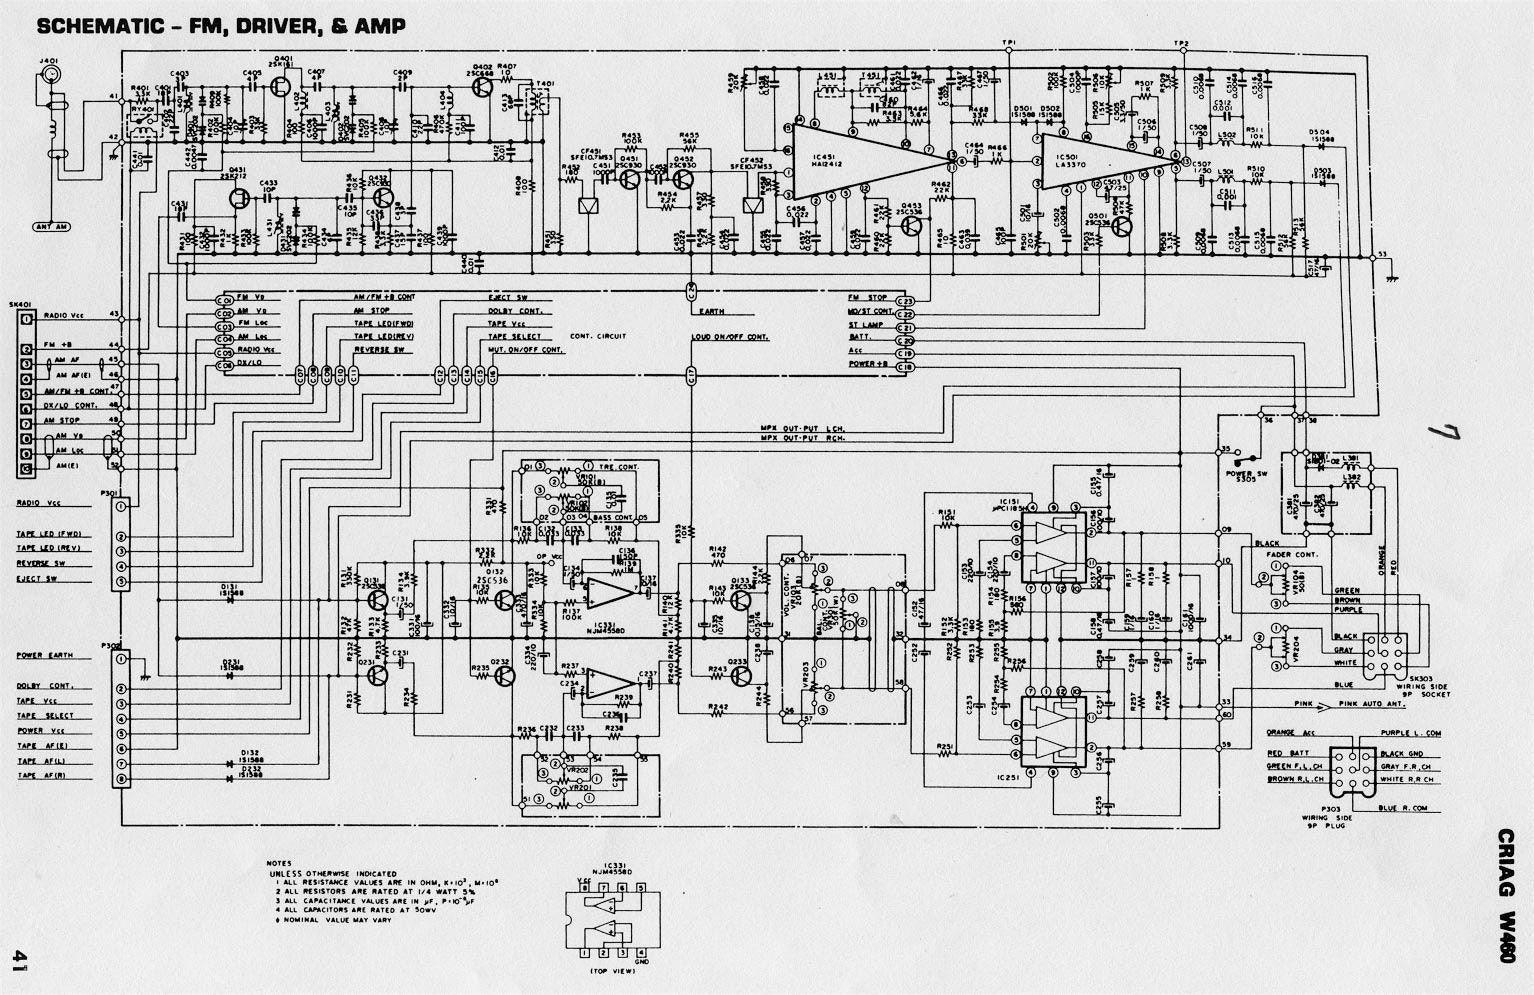 Renault Megane Central Locking Wiring Diagram | Online